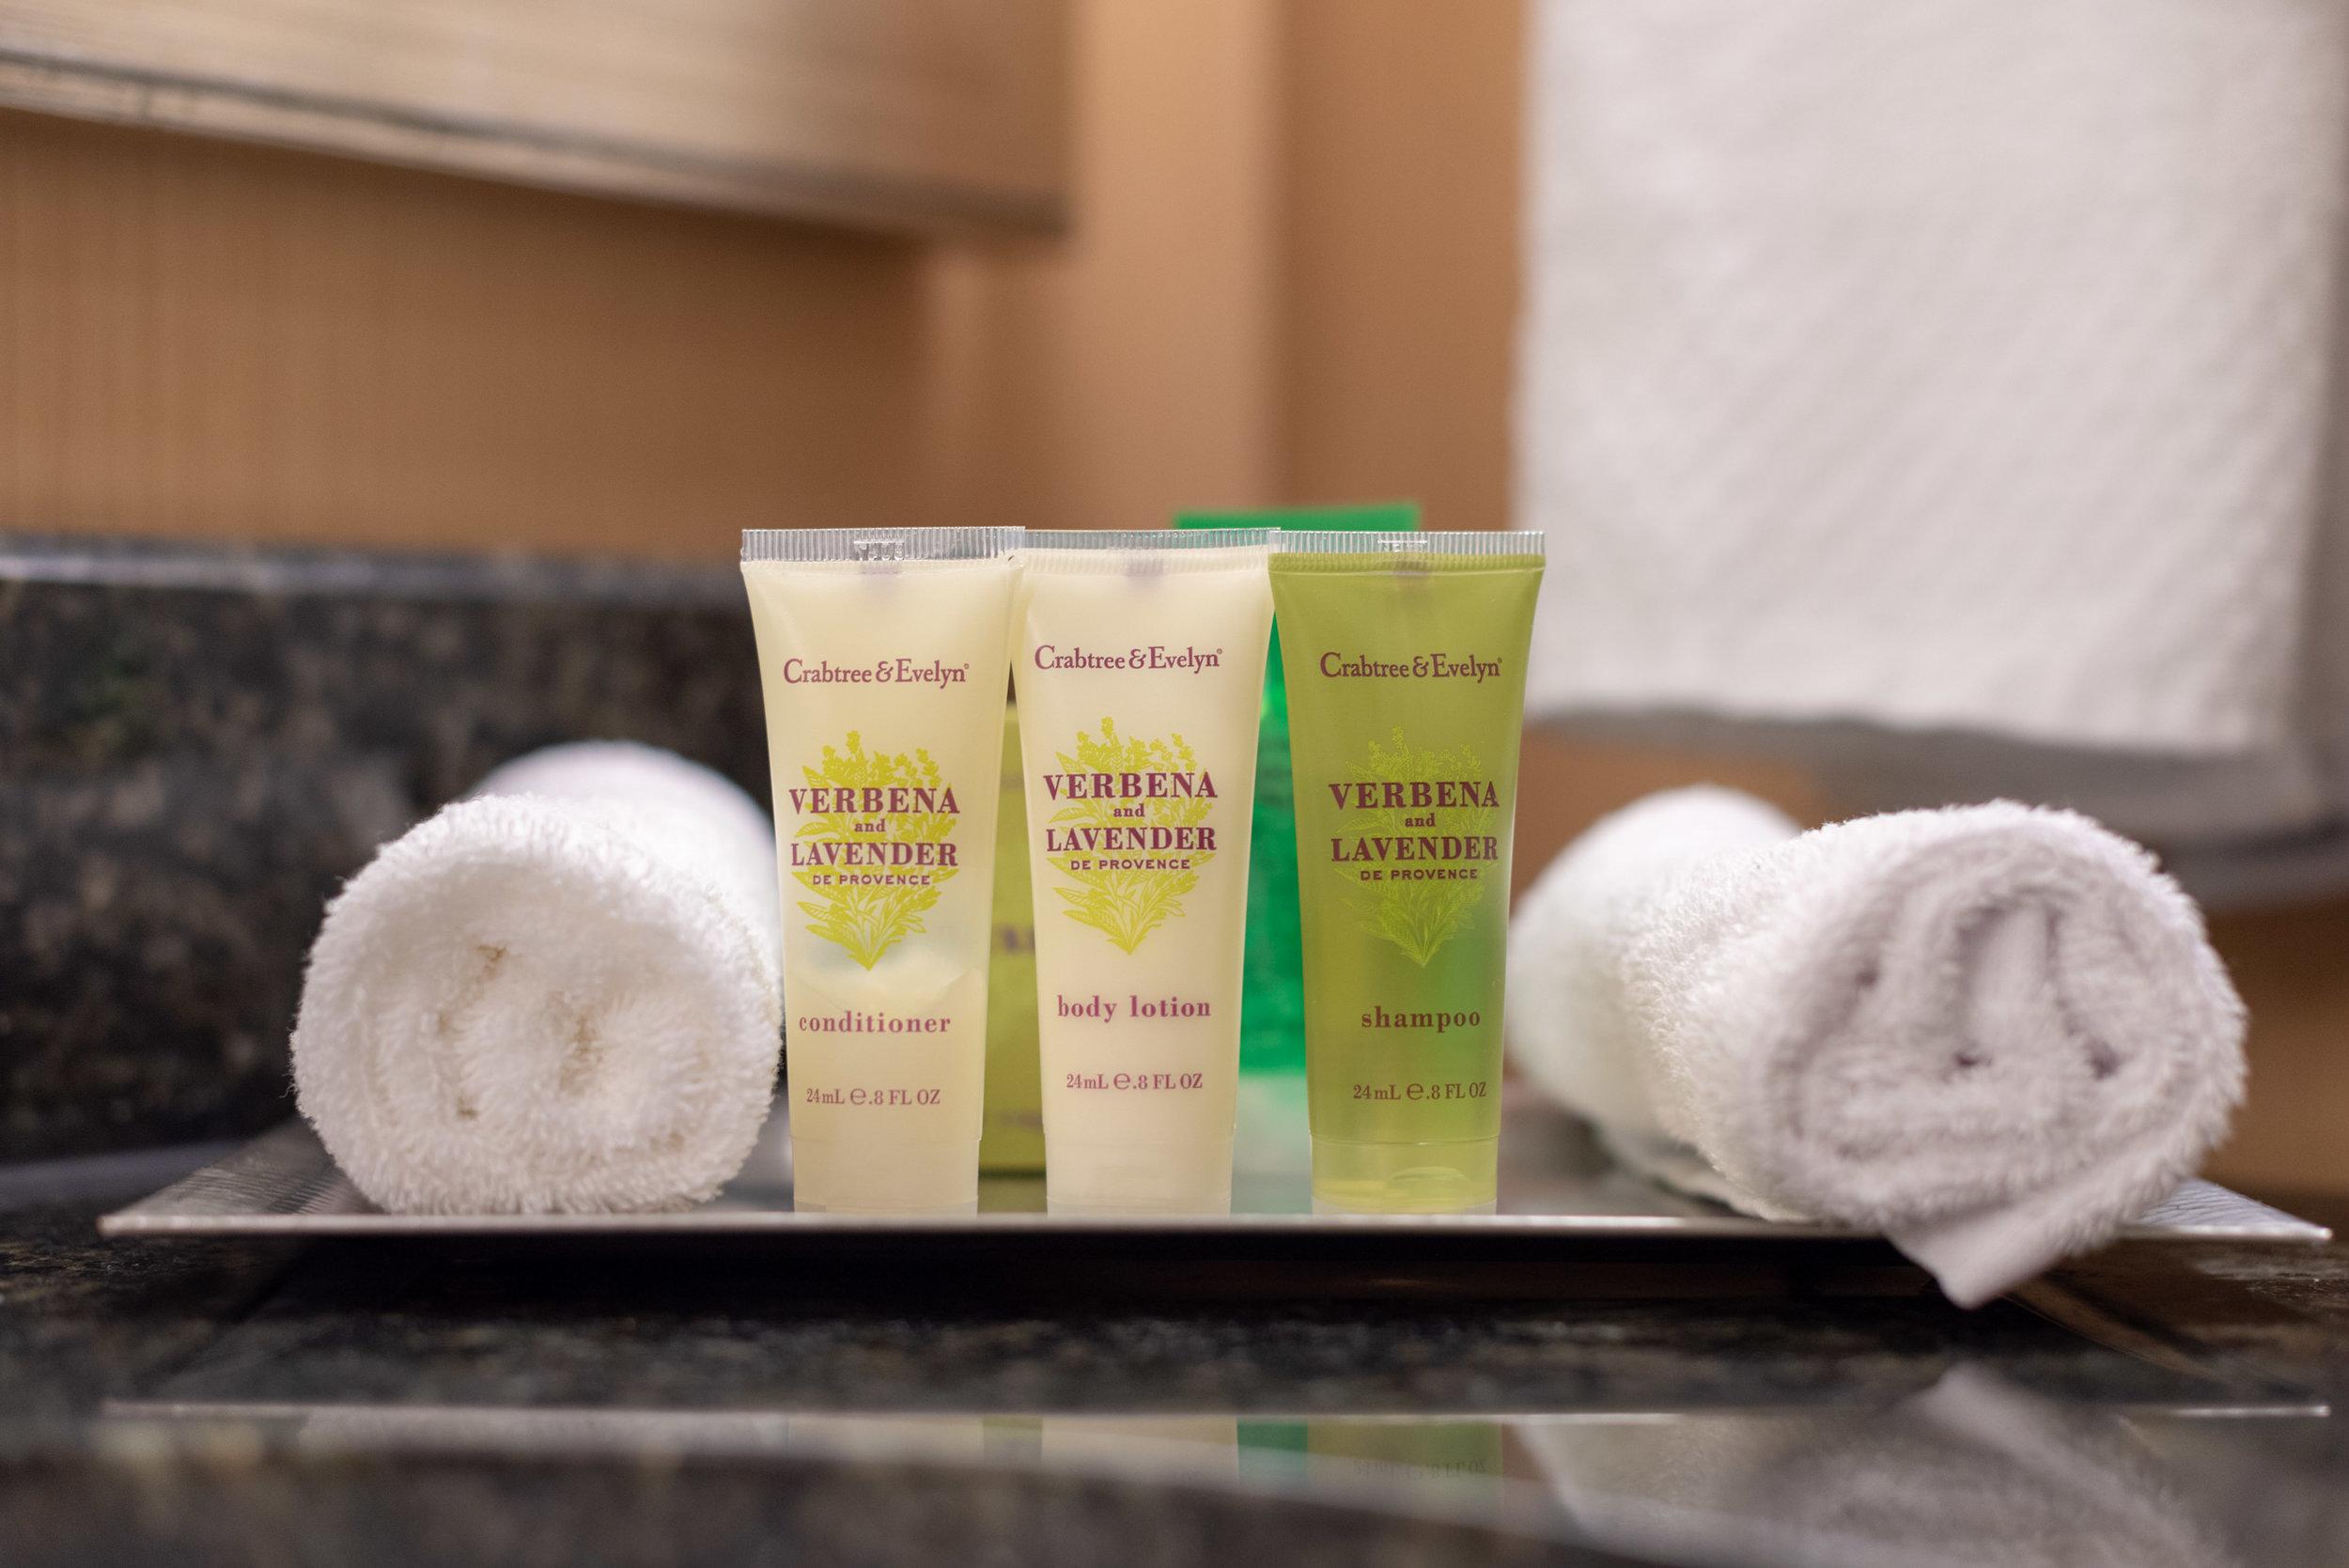 Bath Amenities from Crabtree & Evelyn  Pool View Room - Hilton Orlando